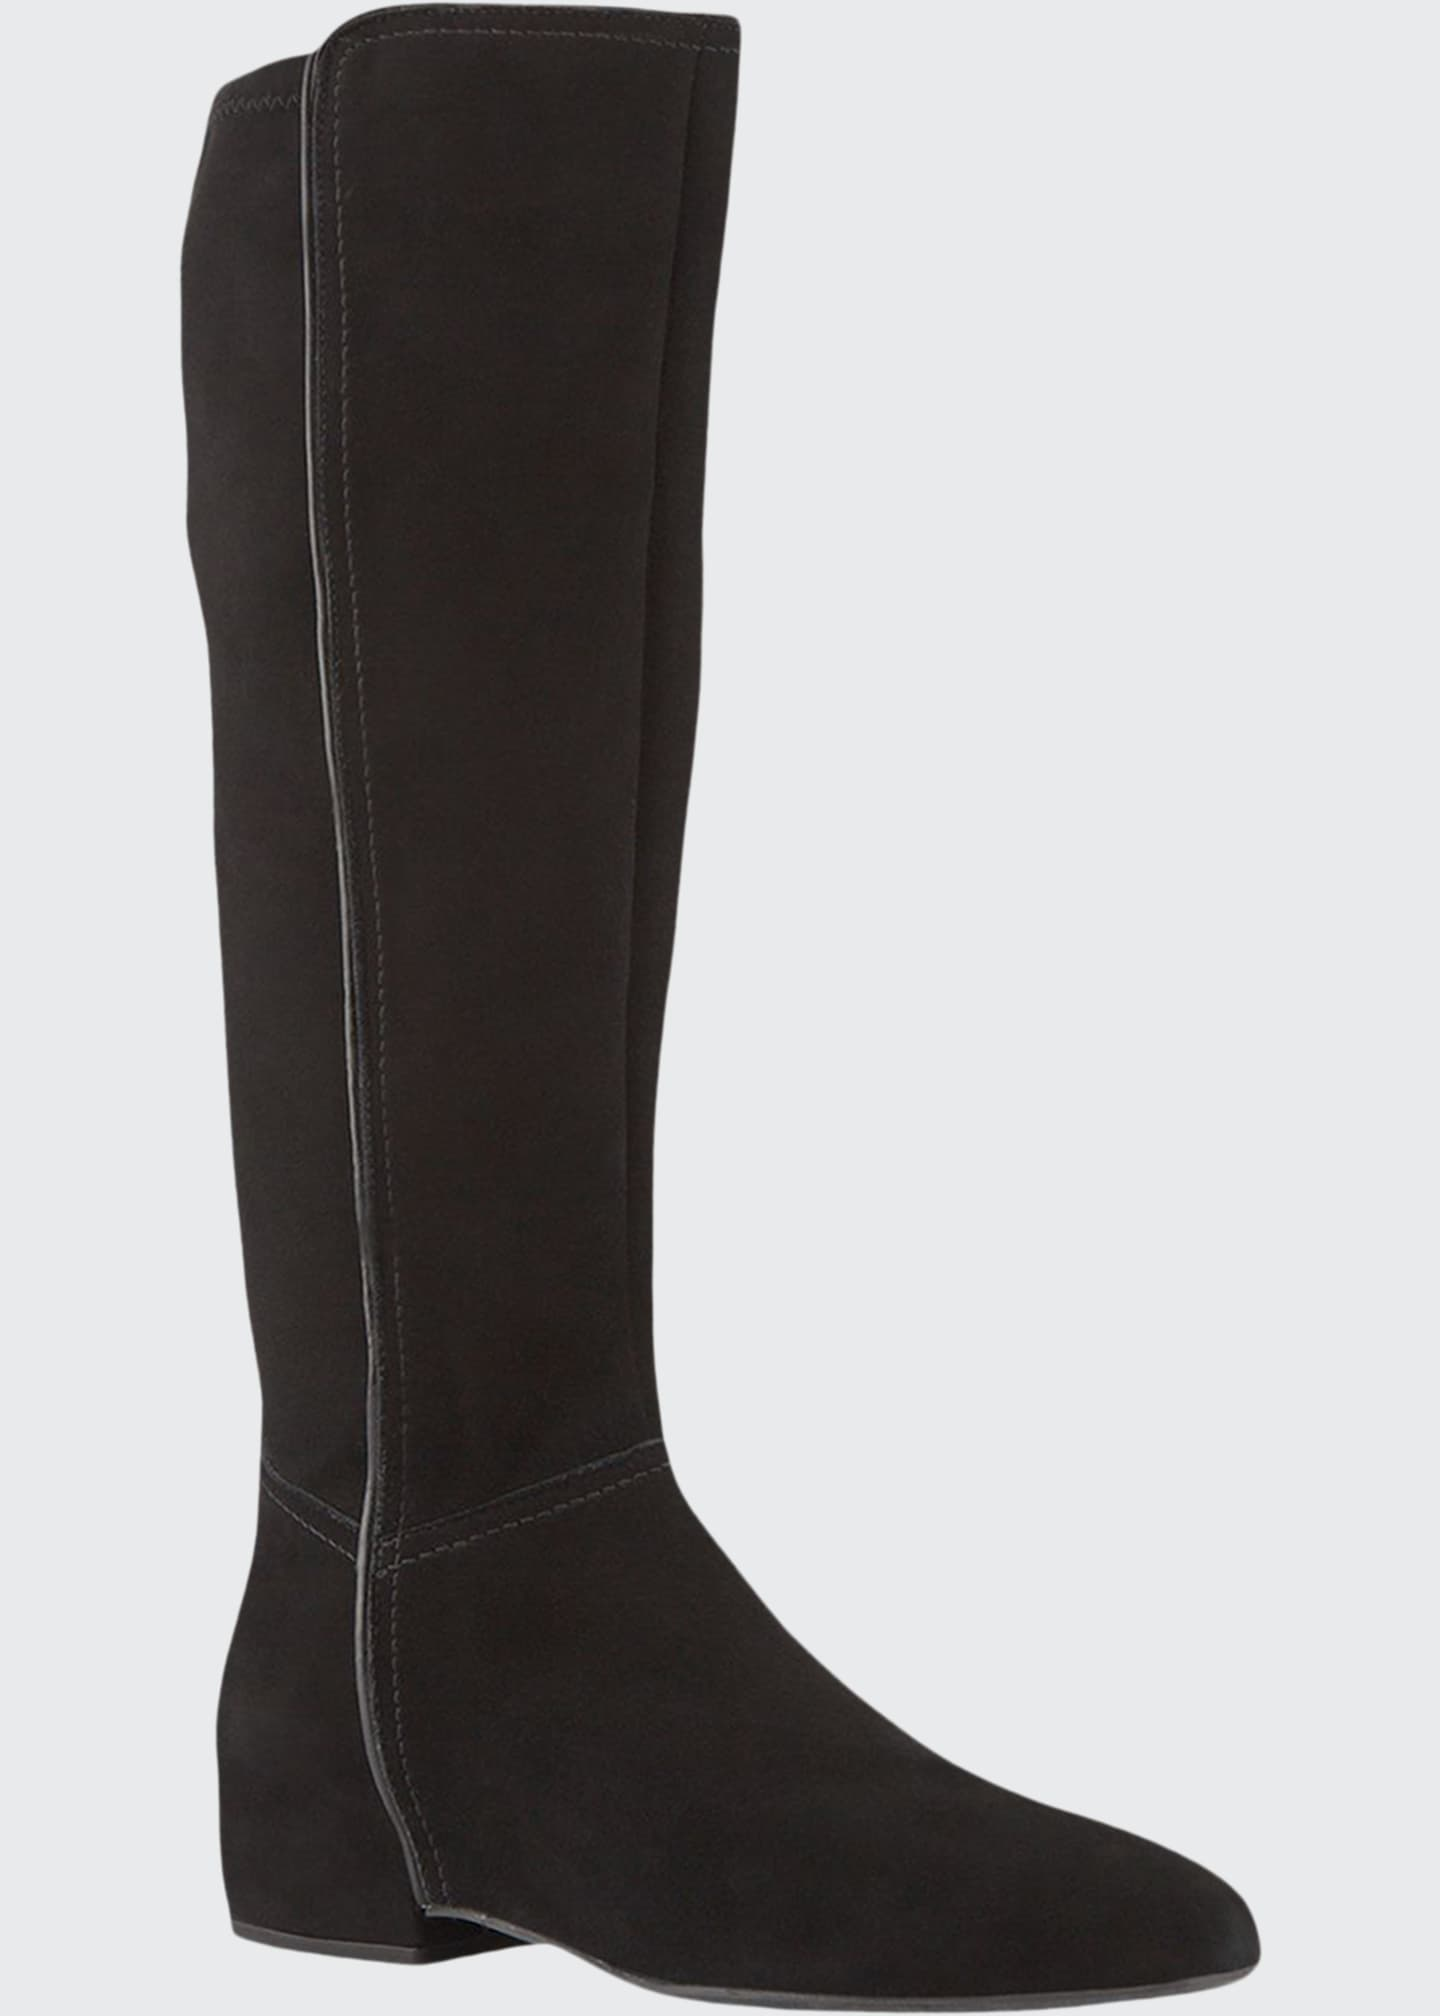 Aquatalia Ursele Stretch Knee Boots